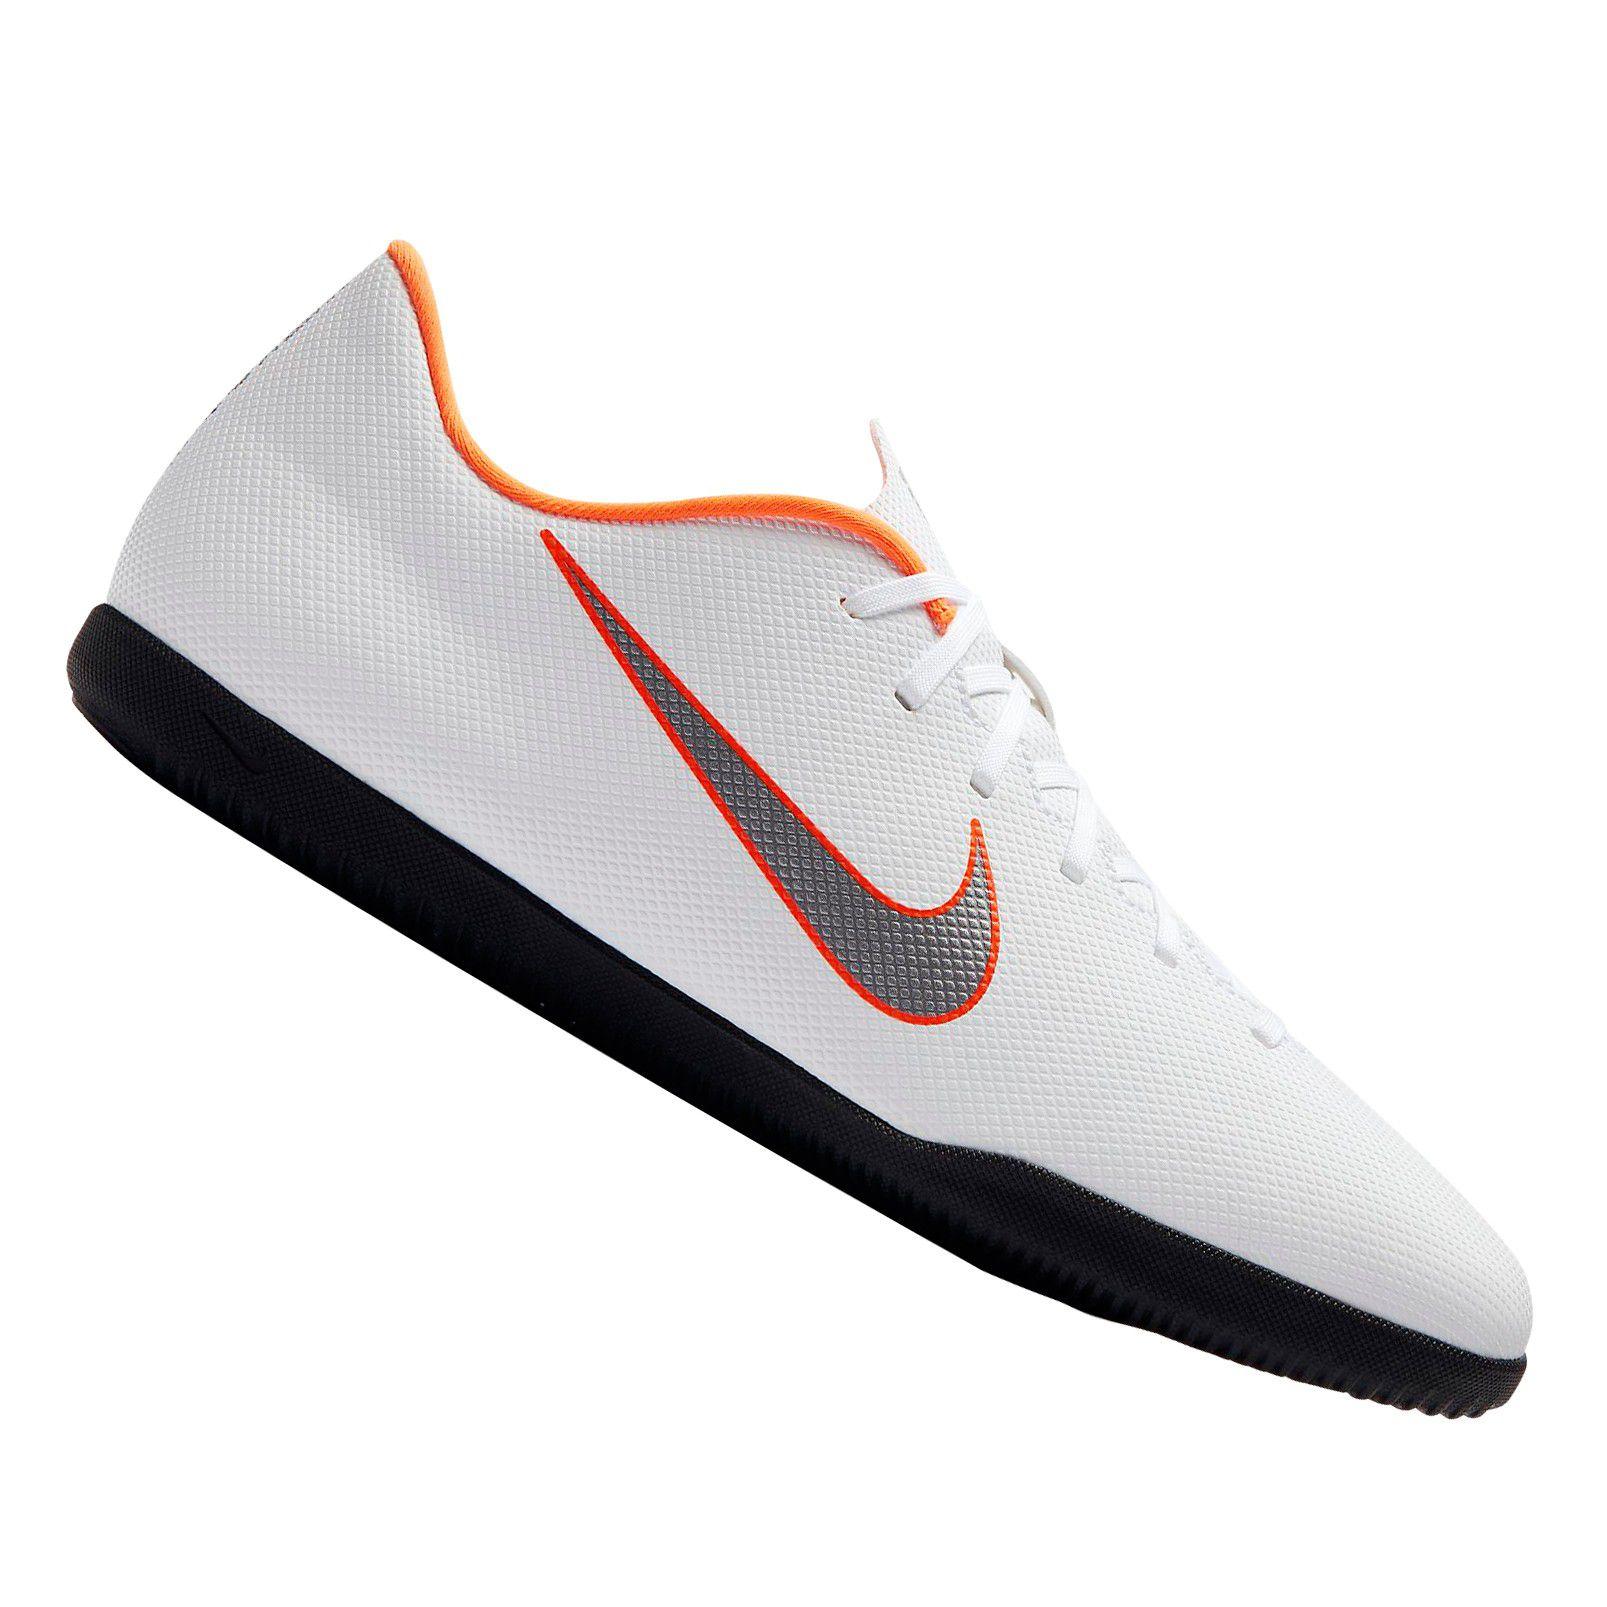 b22265a6a8 Chuteira Nike MercurialX Vapor 12 Club GS IC Futsal Infantil - Sportland ...